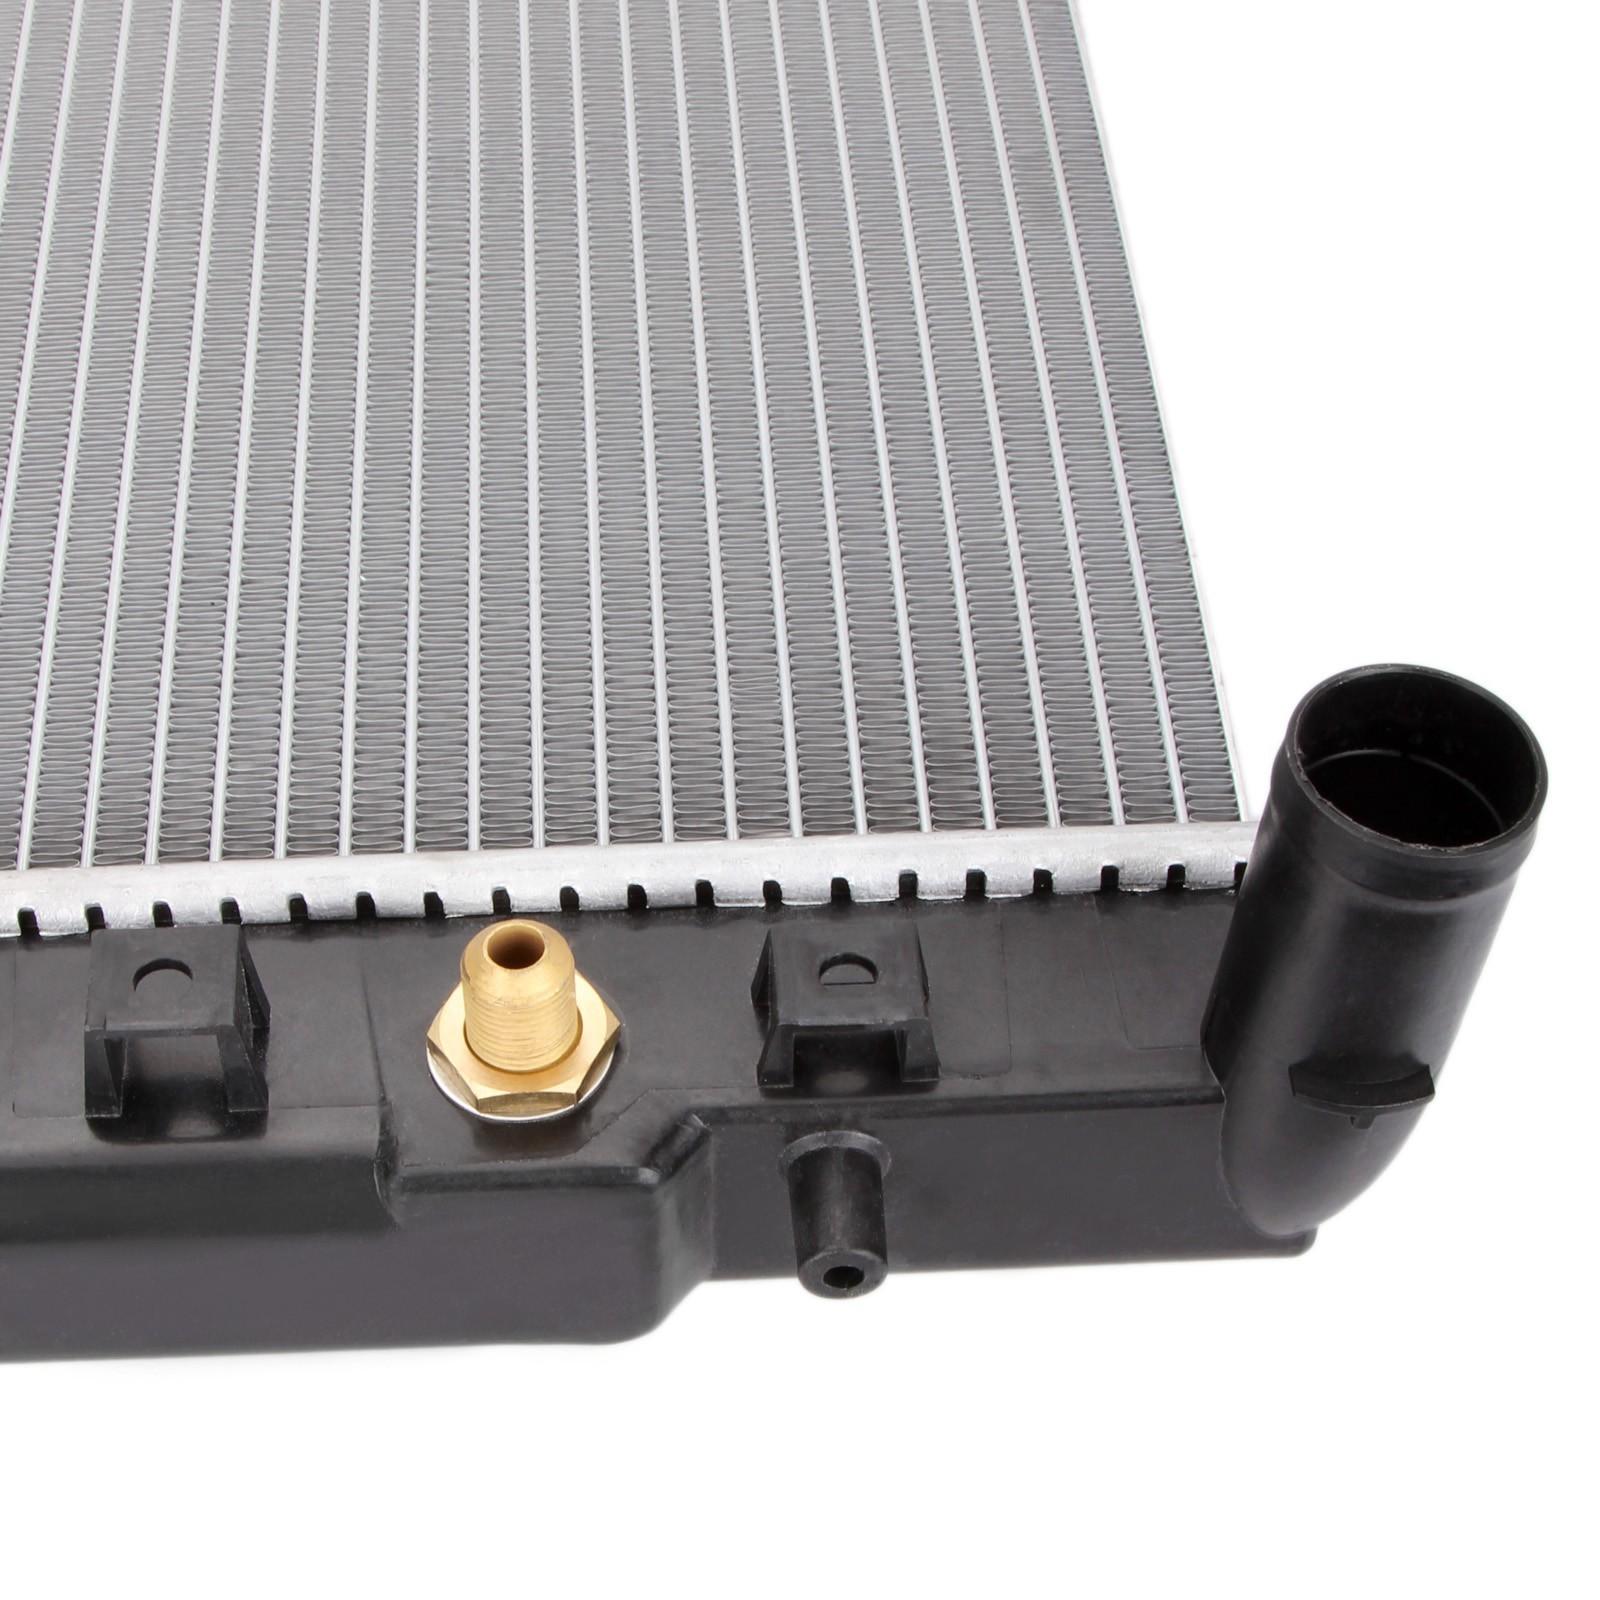 Hot holden radiator 0408 Dromedary Brand